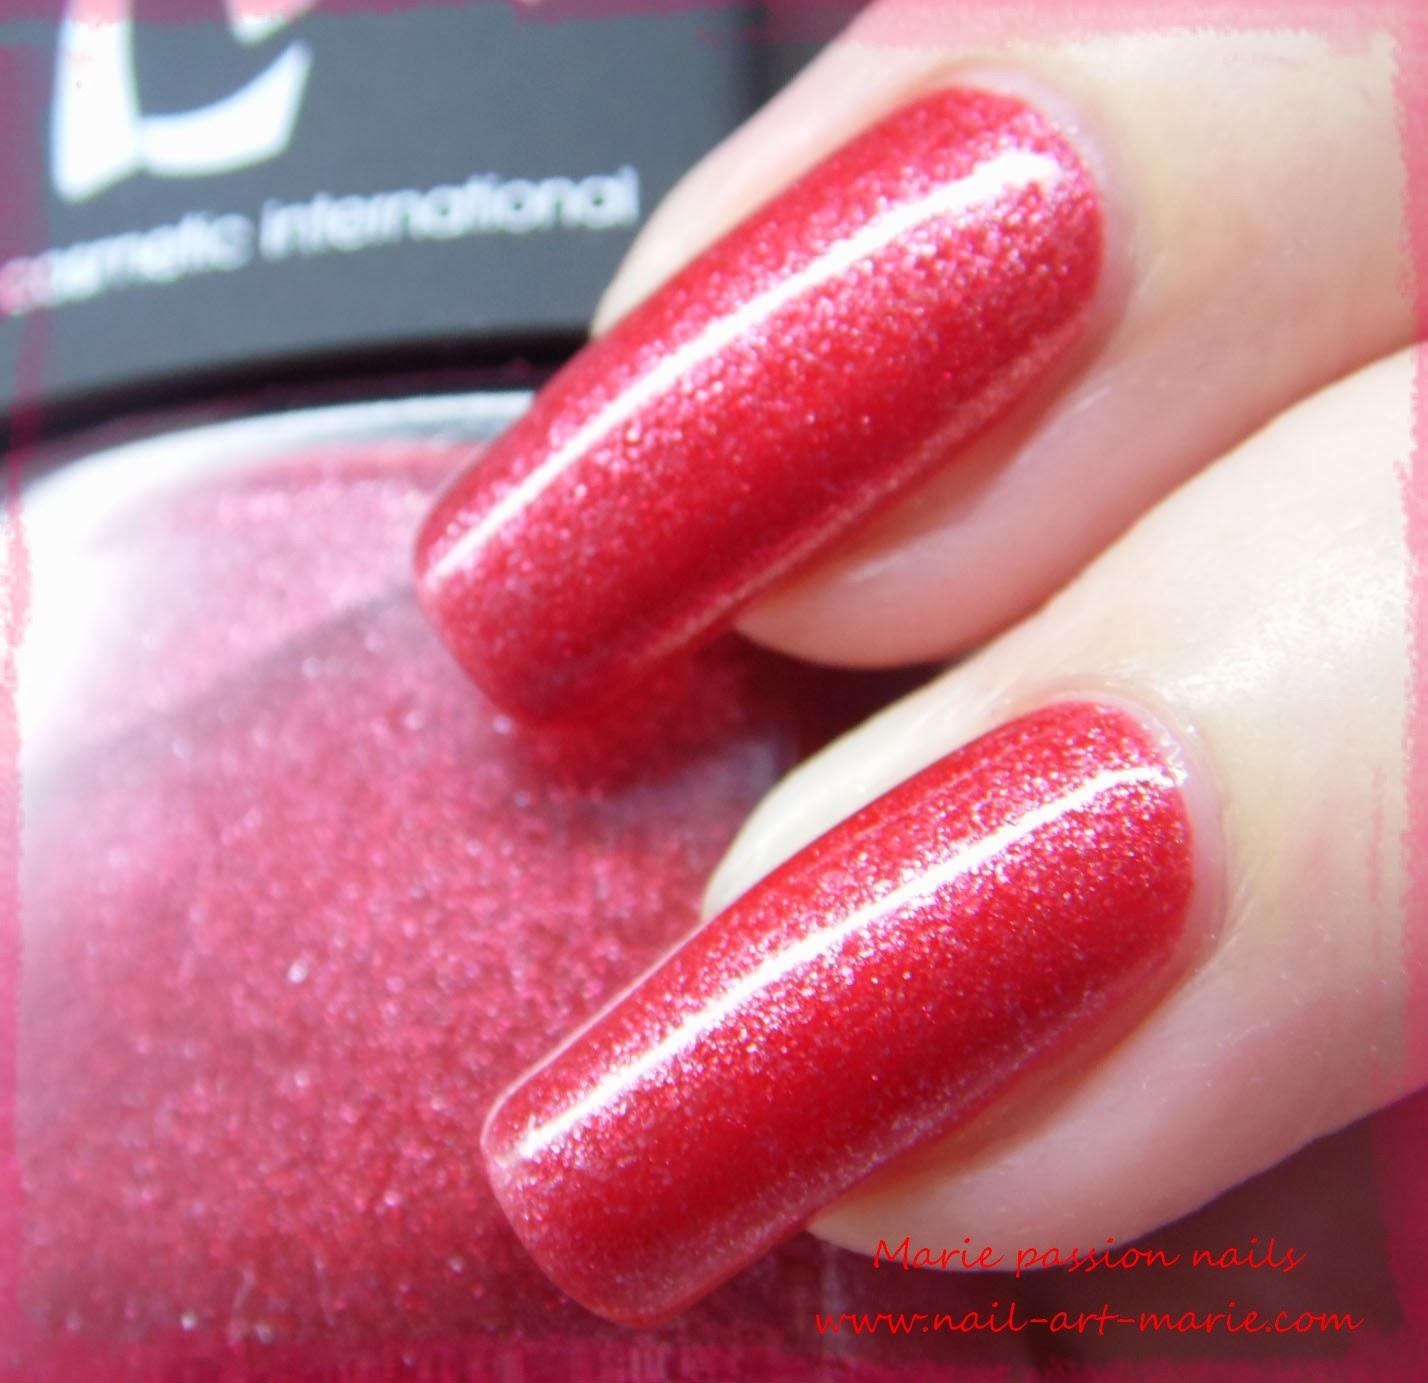 LM Cosmetic Gnaga4